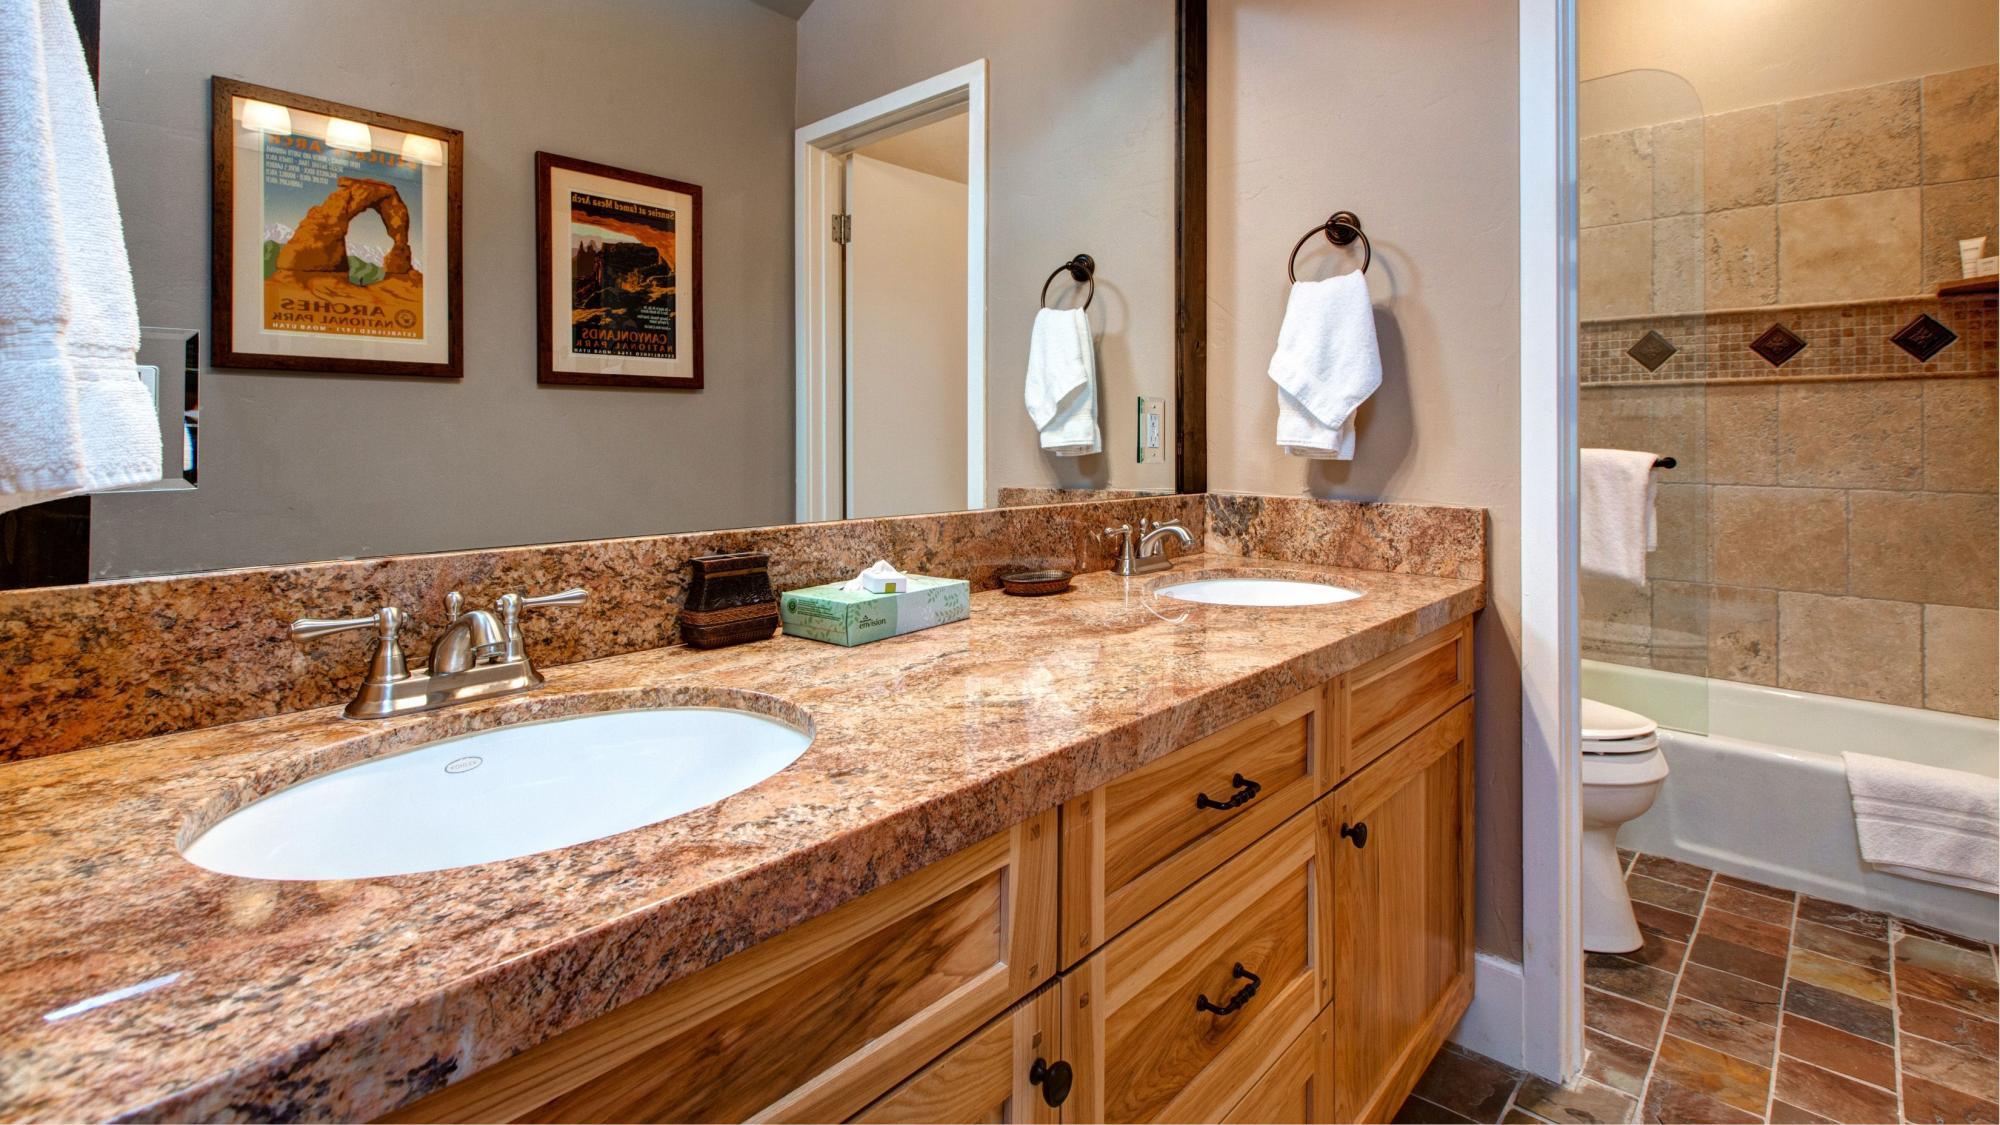 Bathroom Kings 3 kings mountain vista ~ ra131115 | redawning